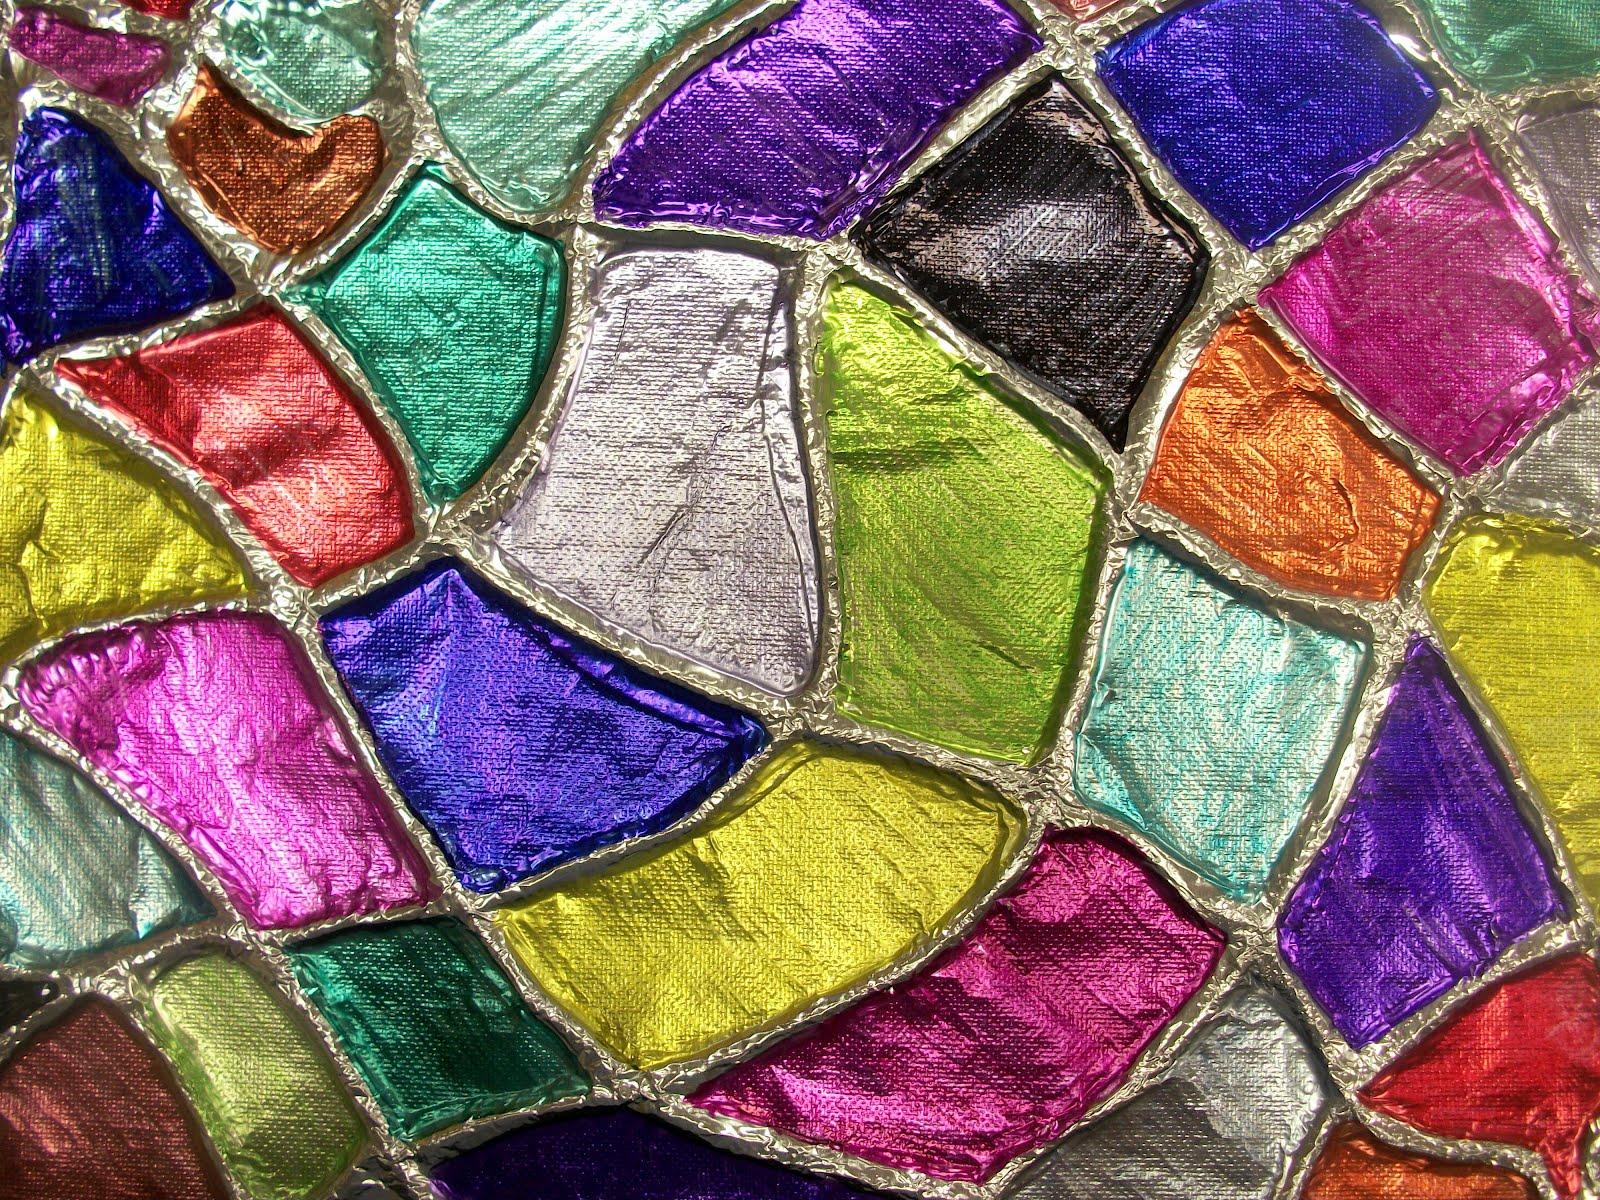 Yarn art color garden - Friday February 3 2012